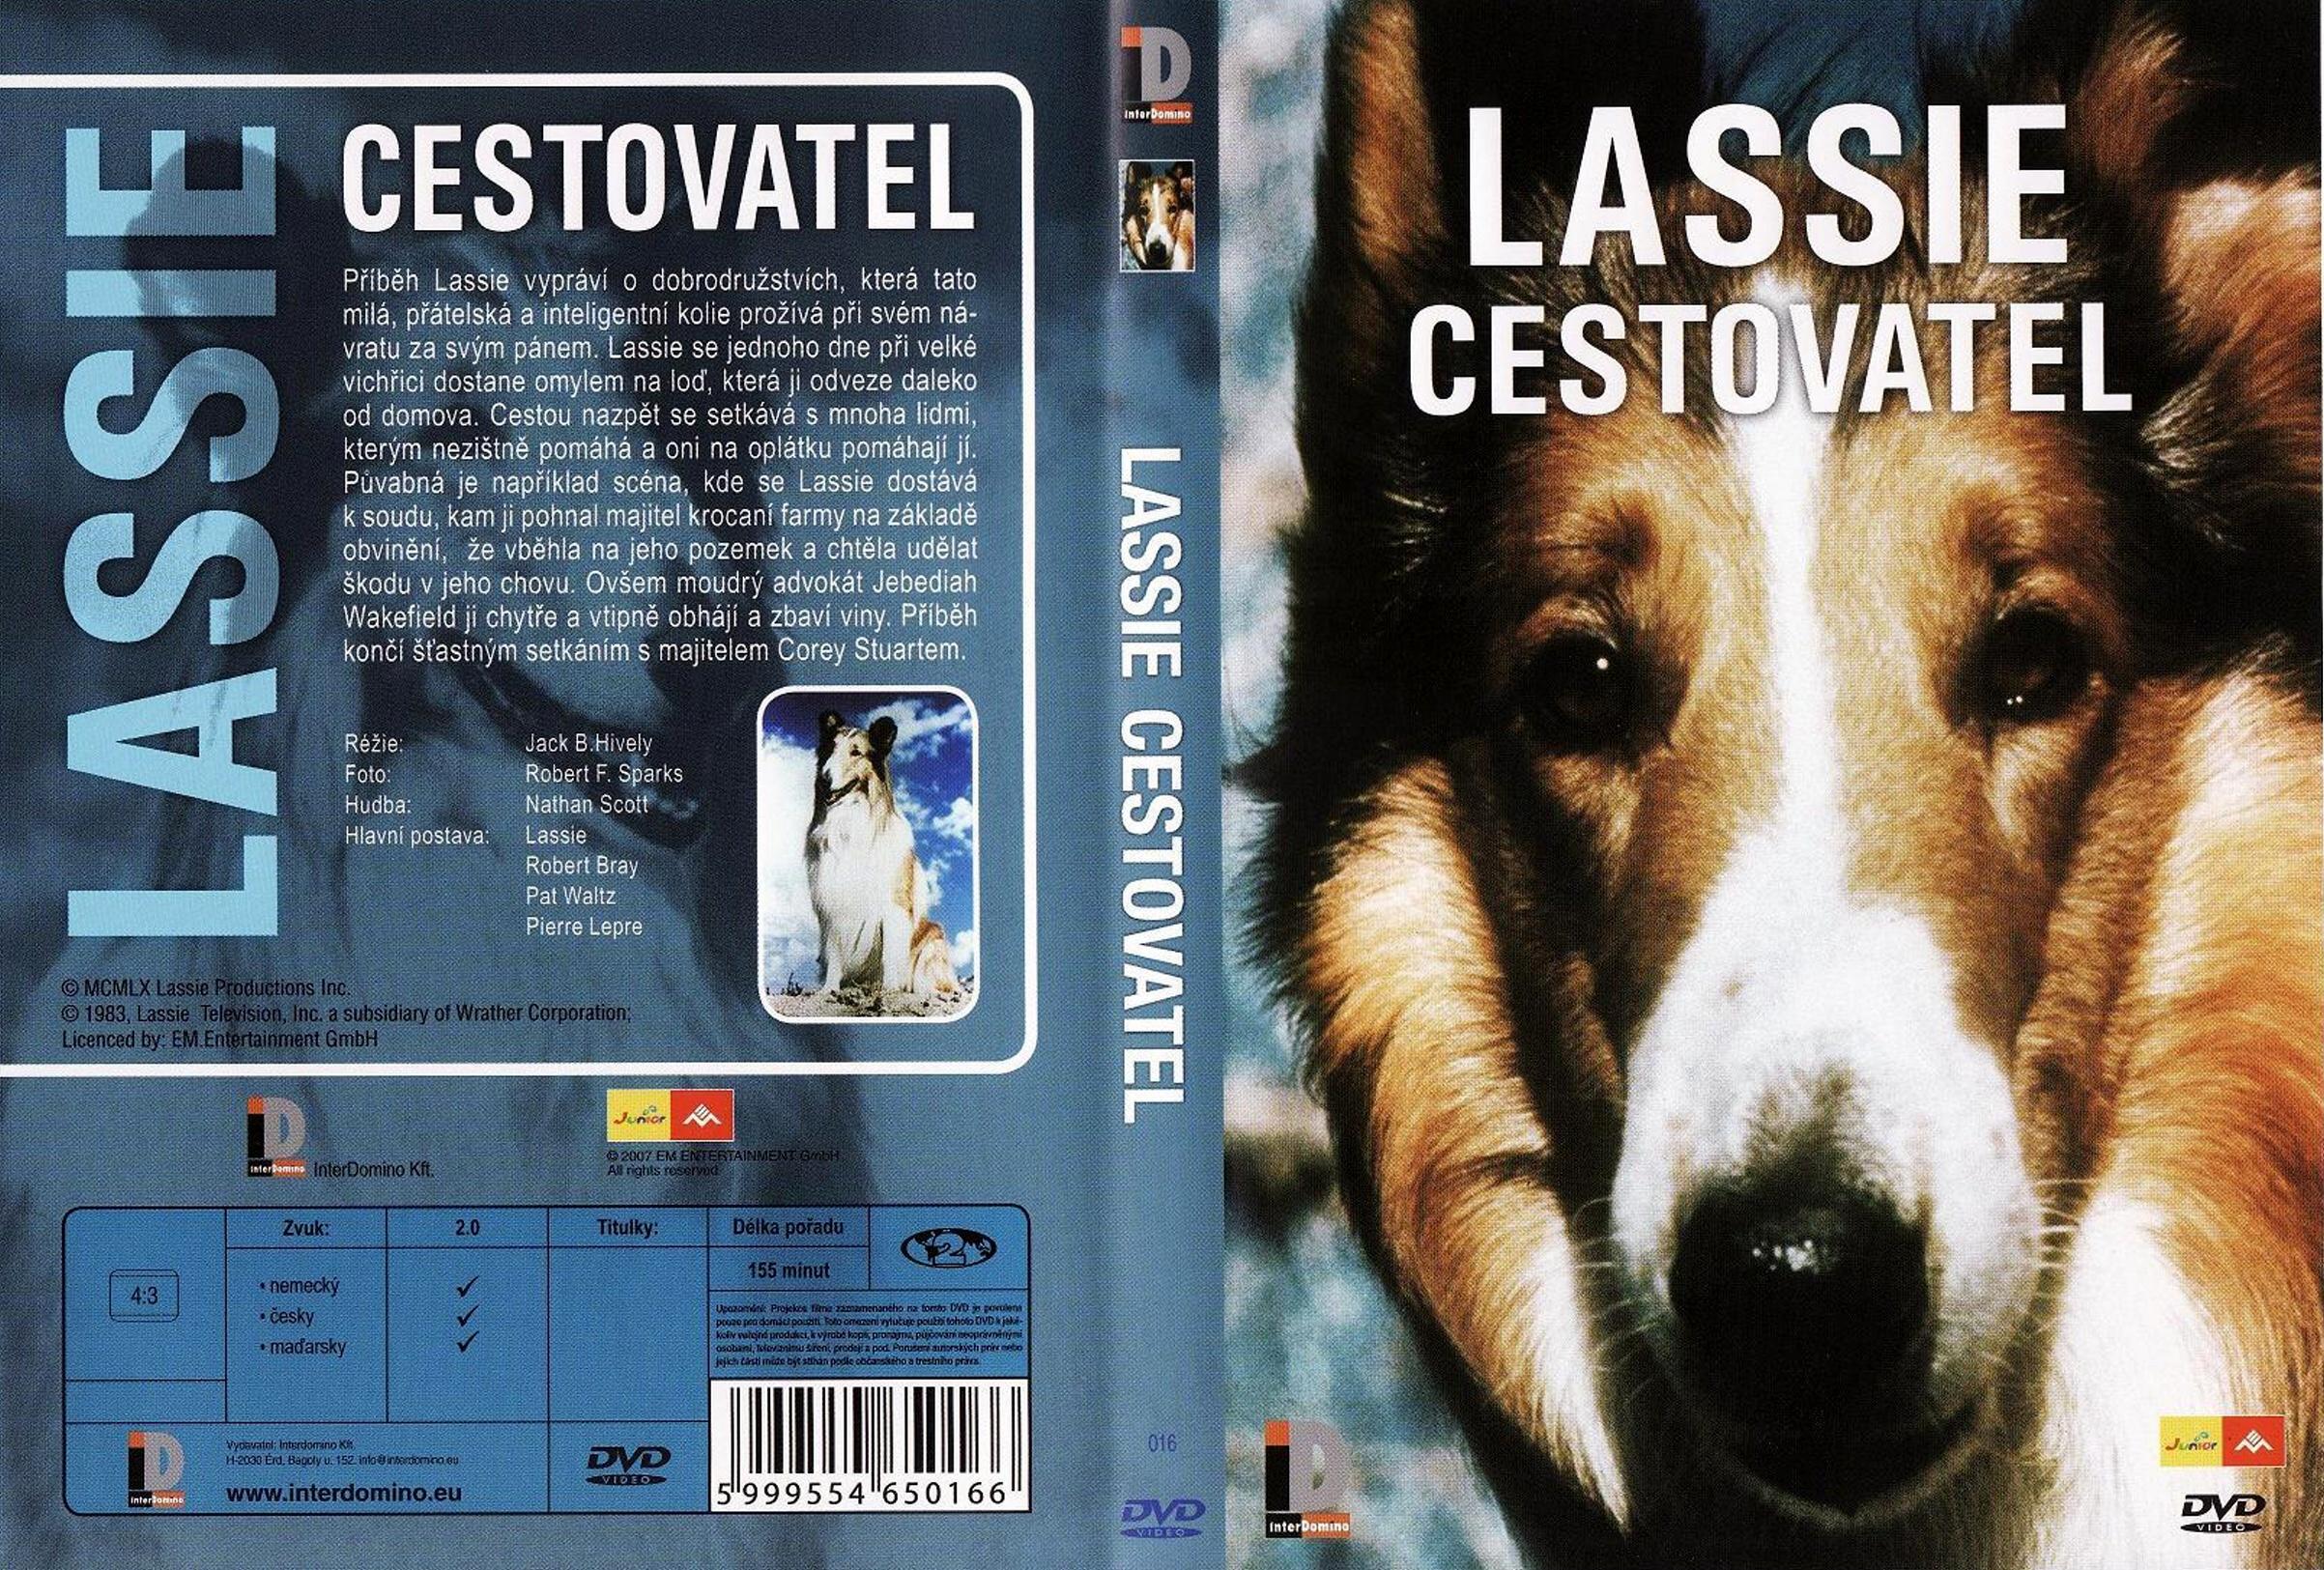 Lassie cestovatel - DVD plast